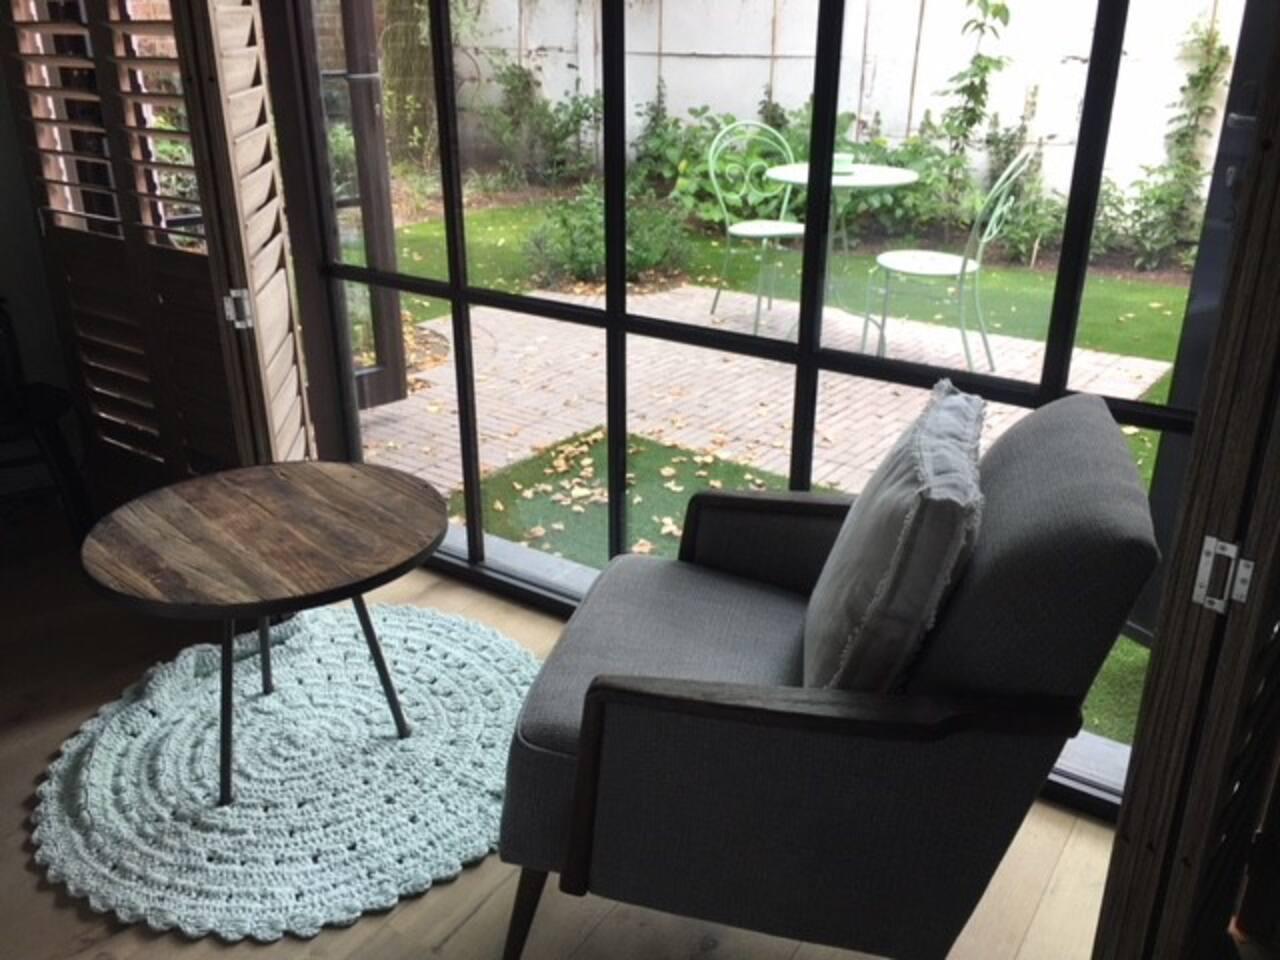 French Green – Garden View